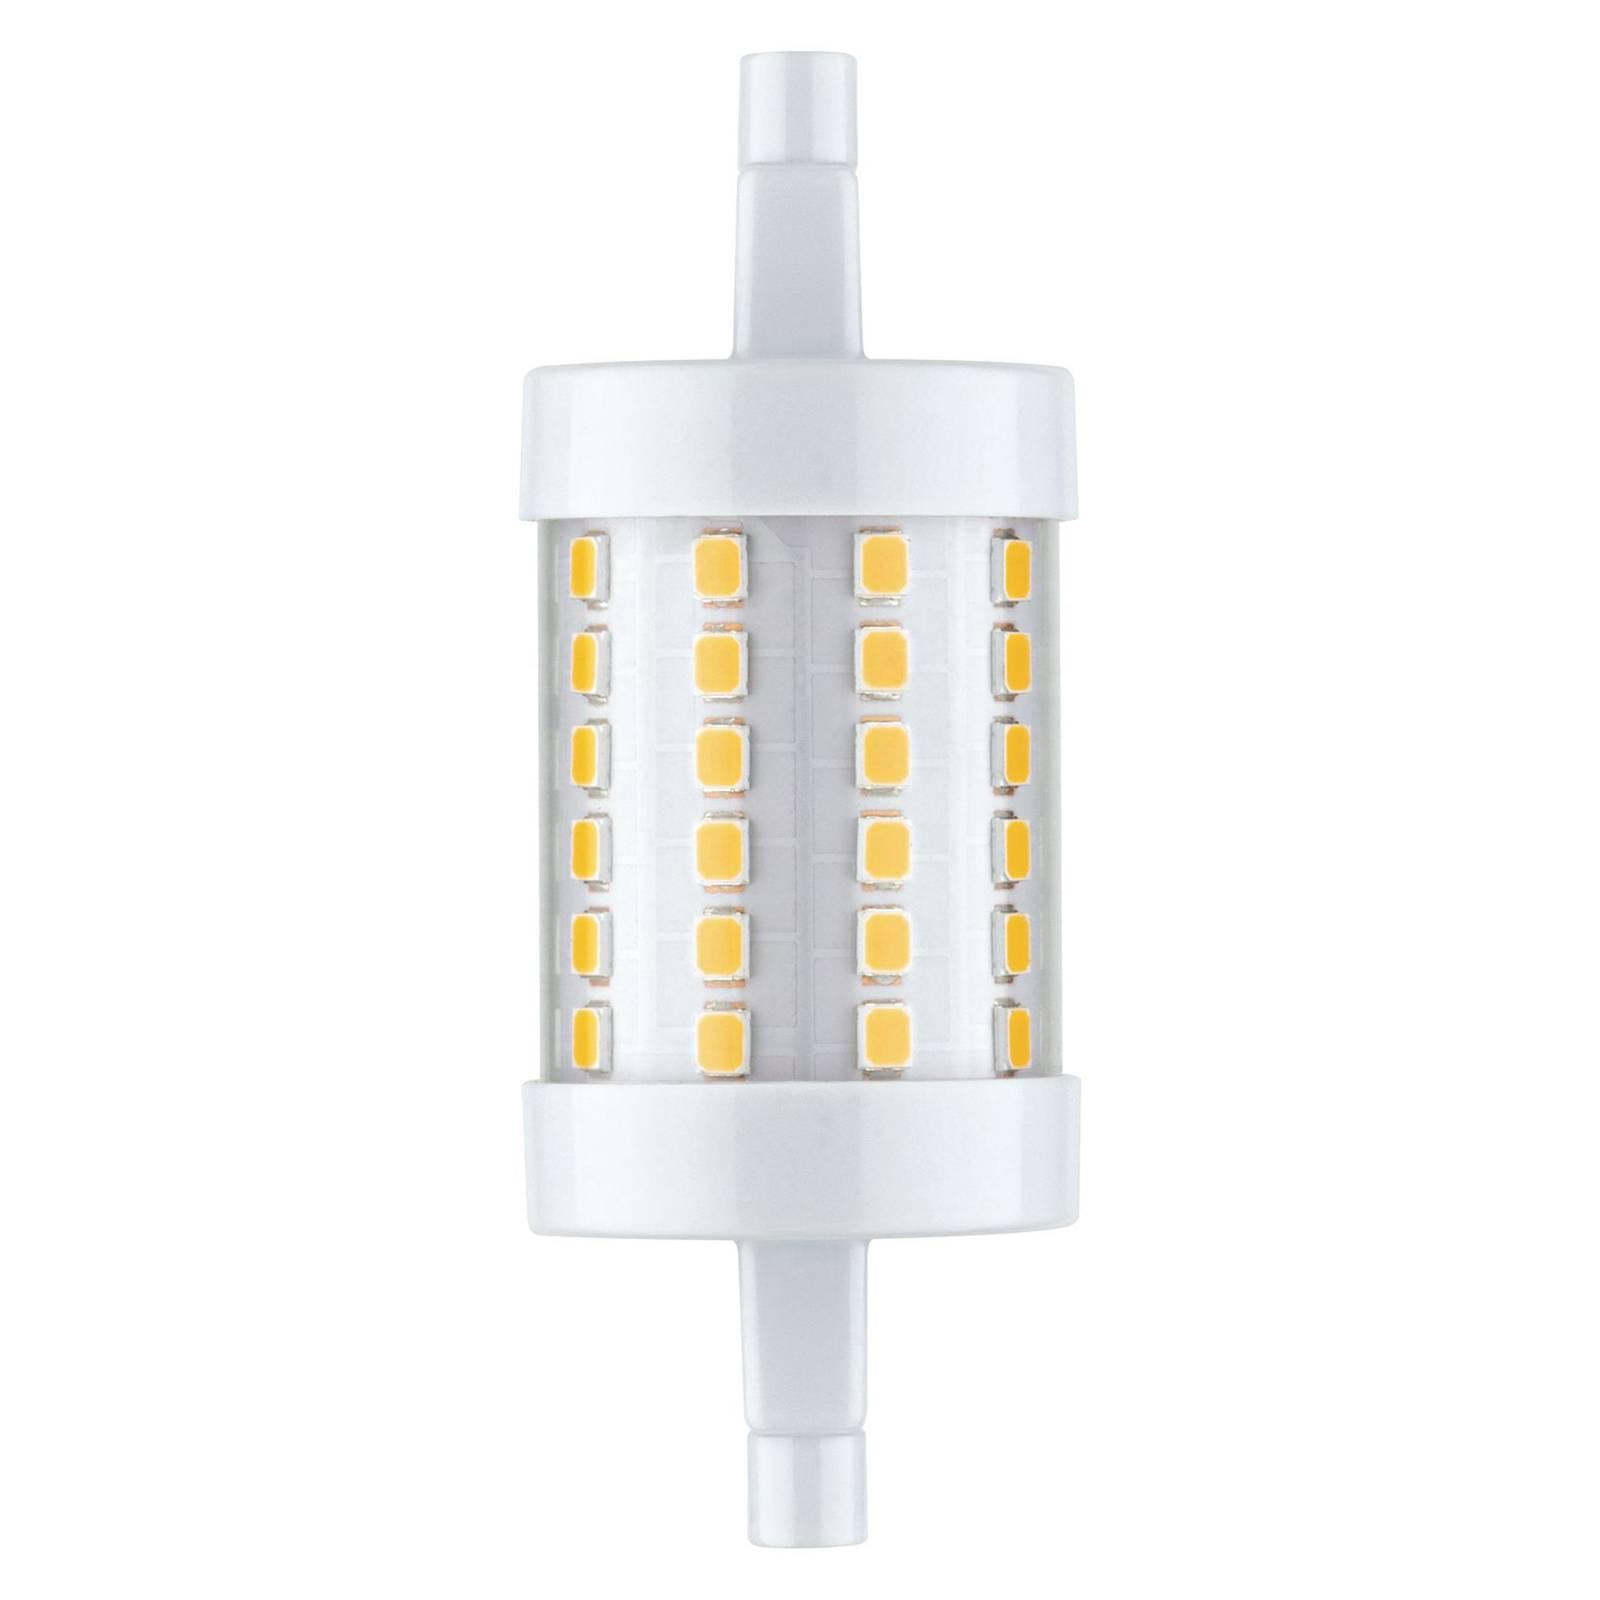 Paulmann-LED-lamppu R7s 78 mm 9 W 950 lm